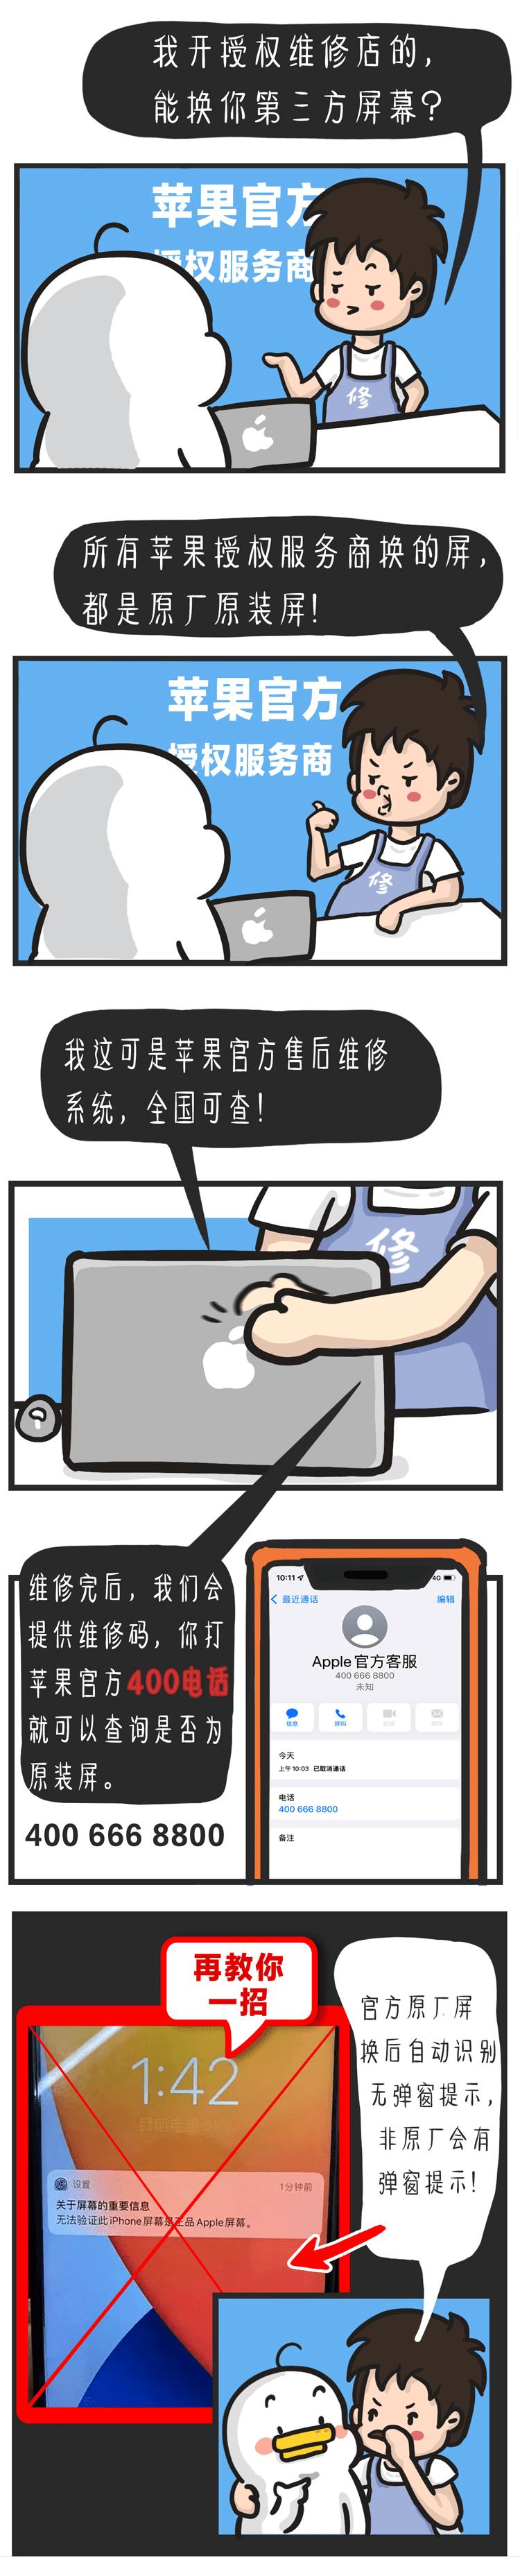 iPhone 13这么买能省上千块!网友傻眼:库克退钱!